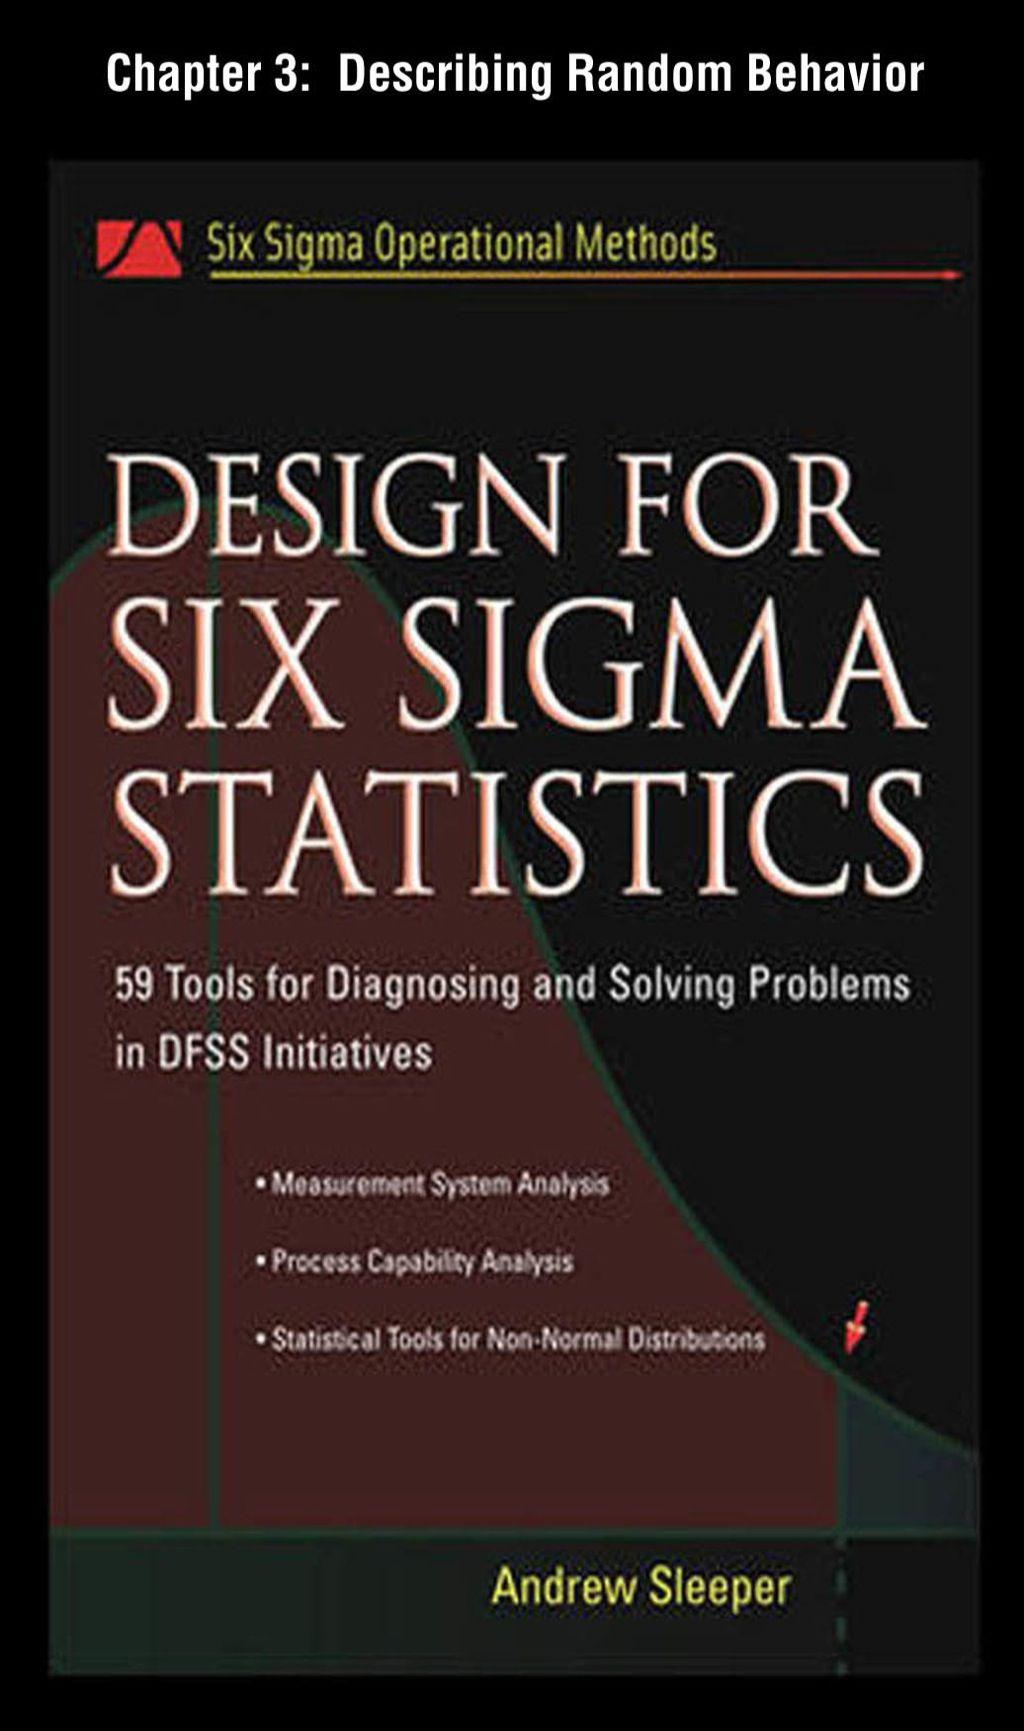 Design For Six Sigma Statistics Chapter 3